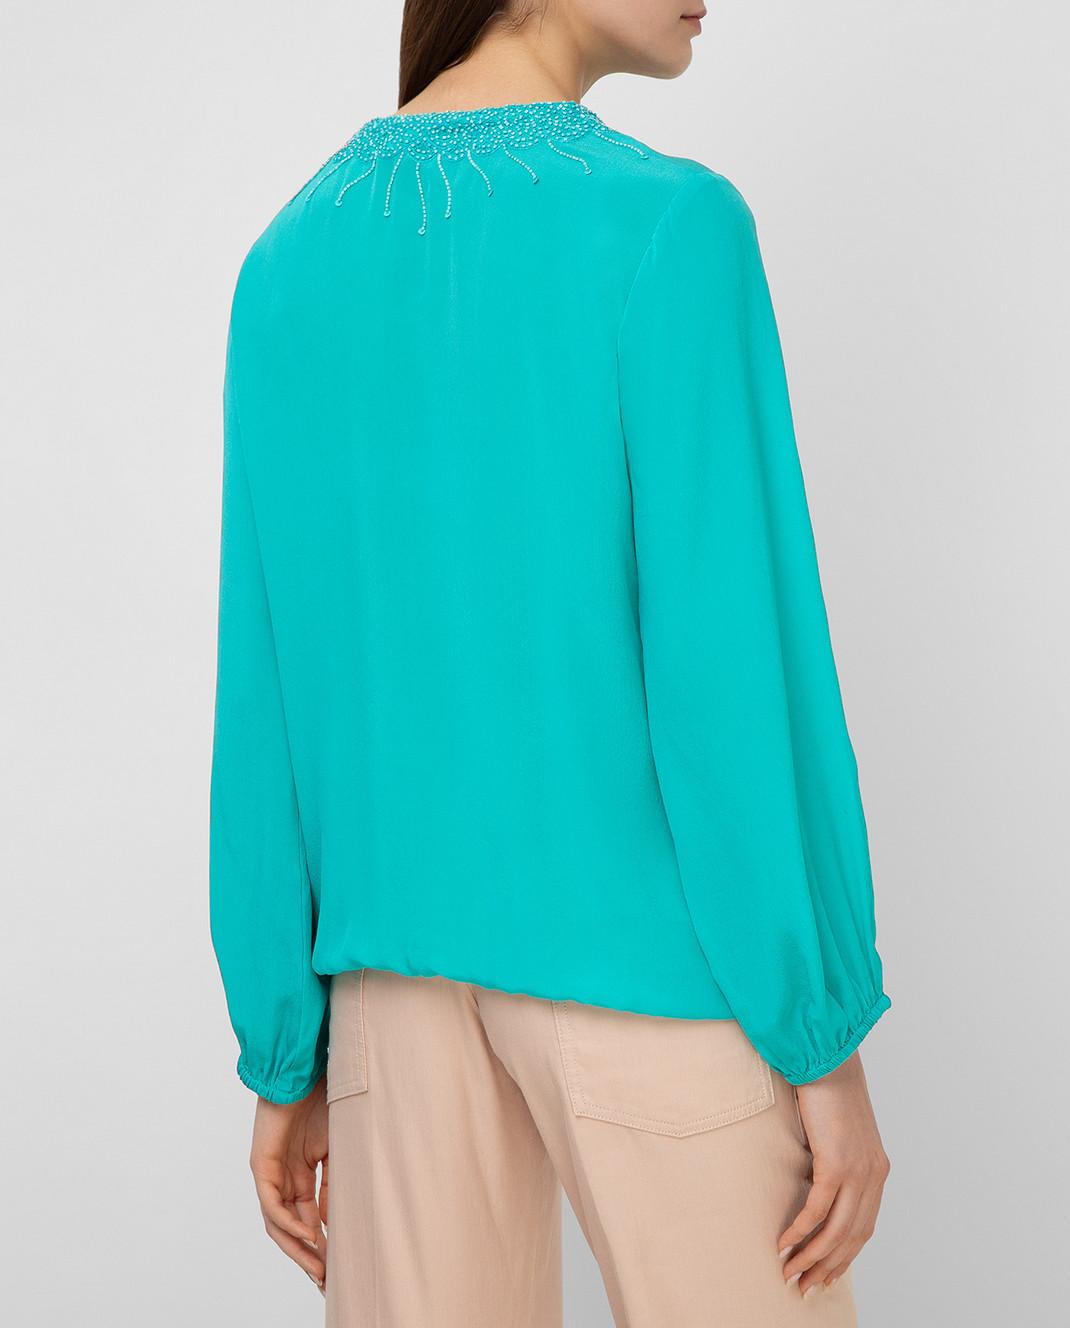 Taj by Sabrina Бирюзовая блуза из шелка SUSH1087 изображение 4